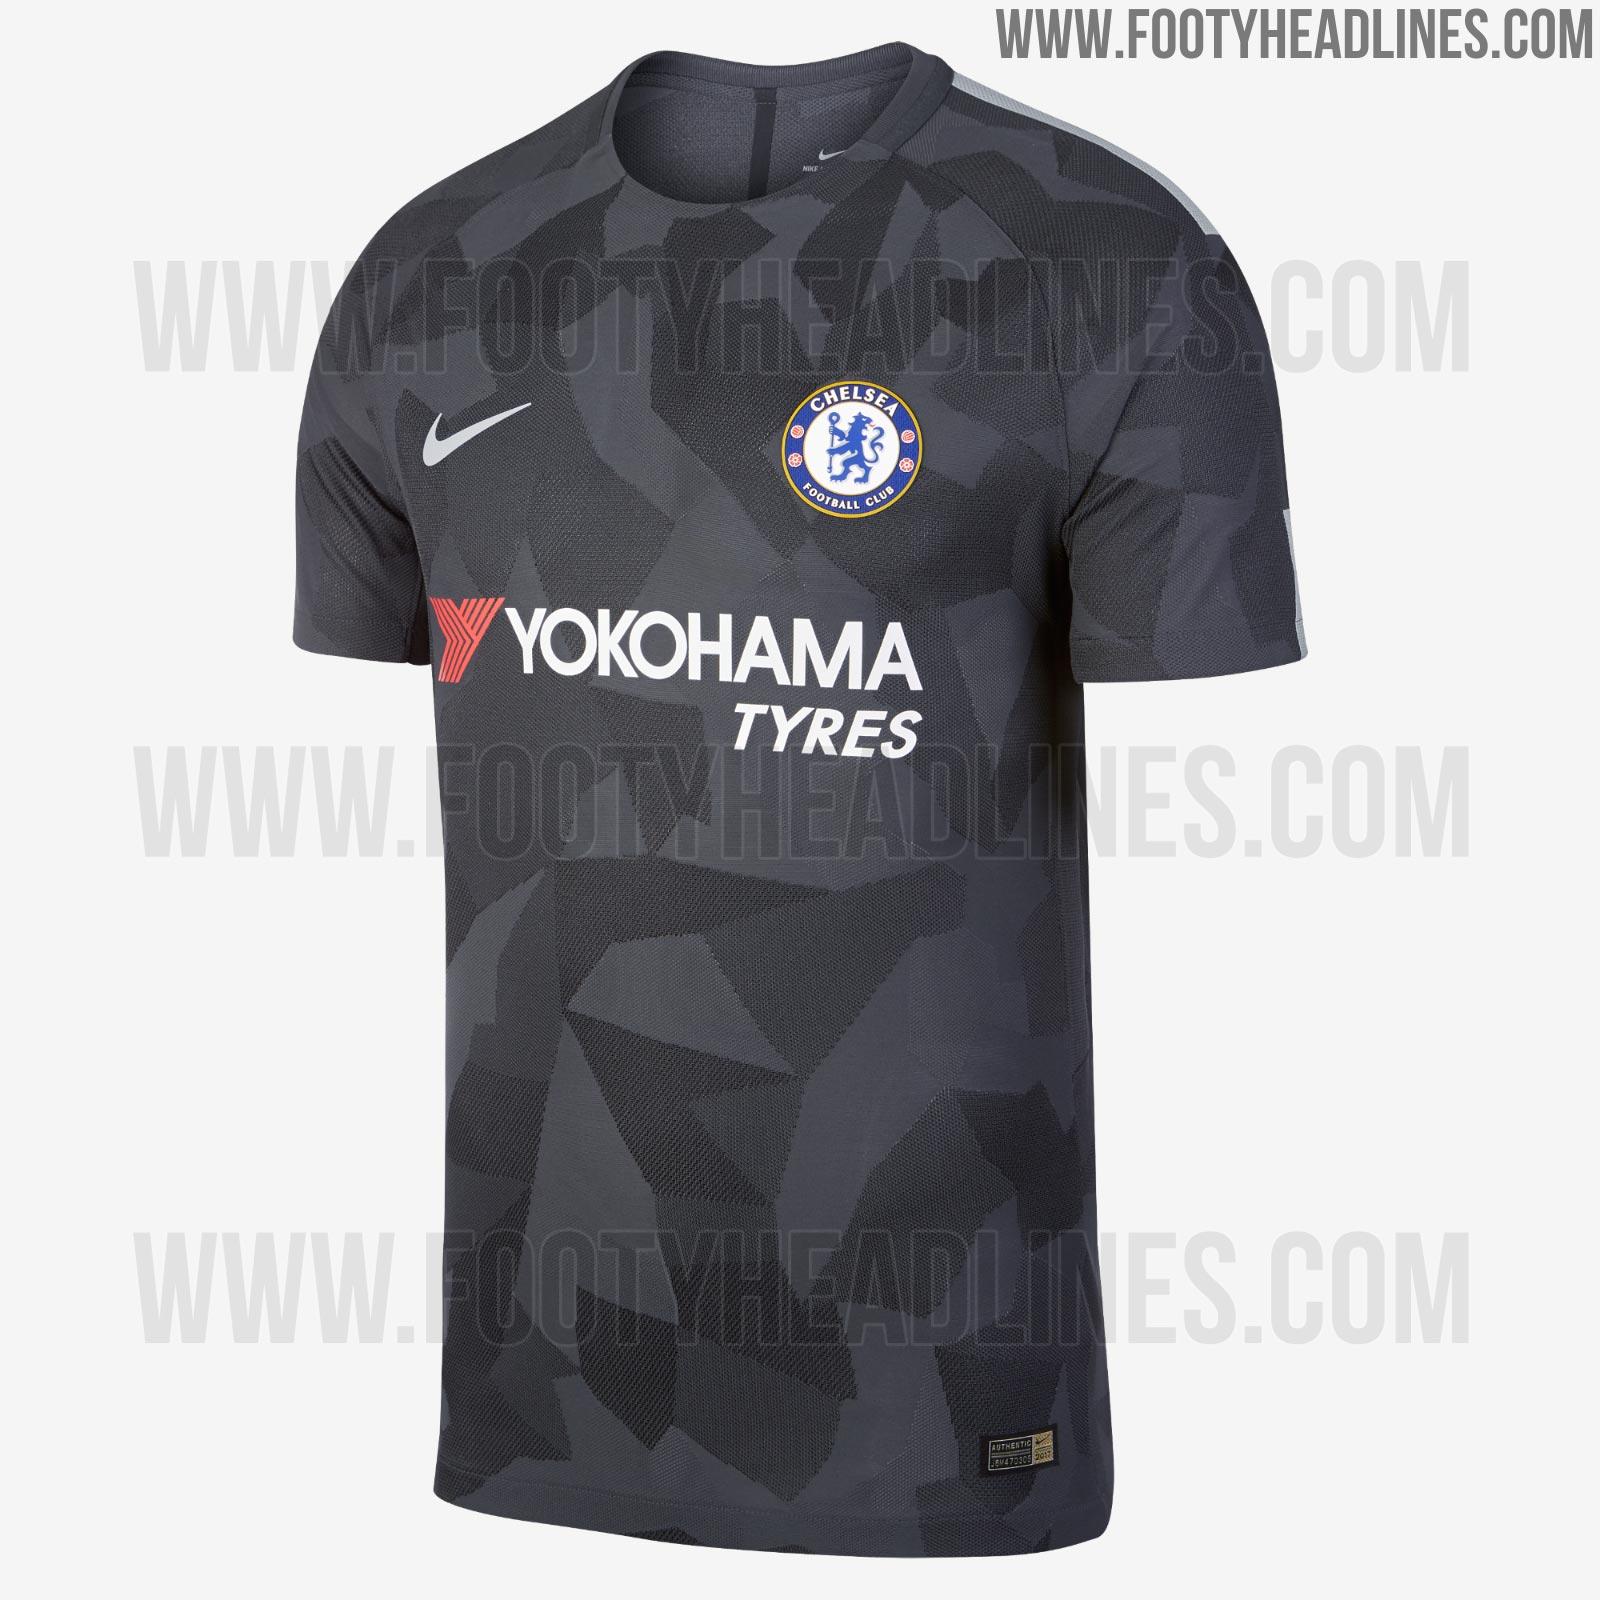 Nike 17 18 Third Kits Released Barcelona Chelsea